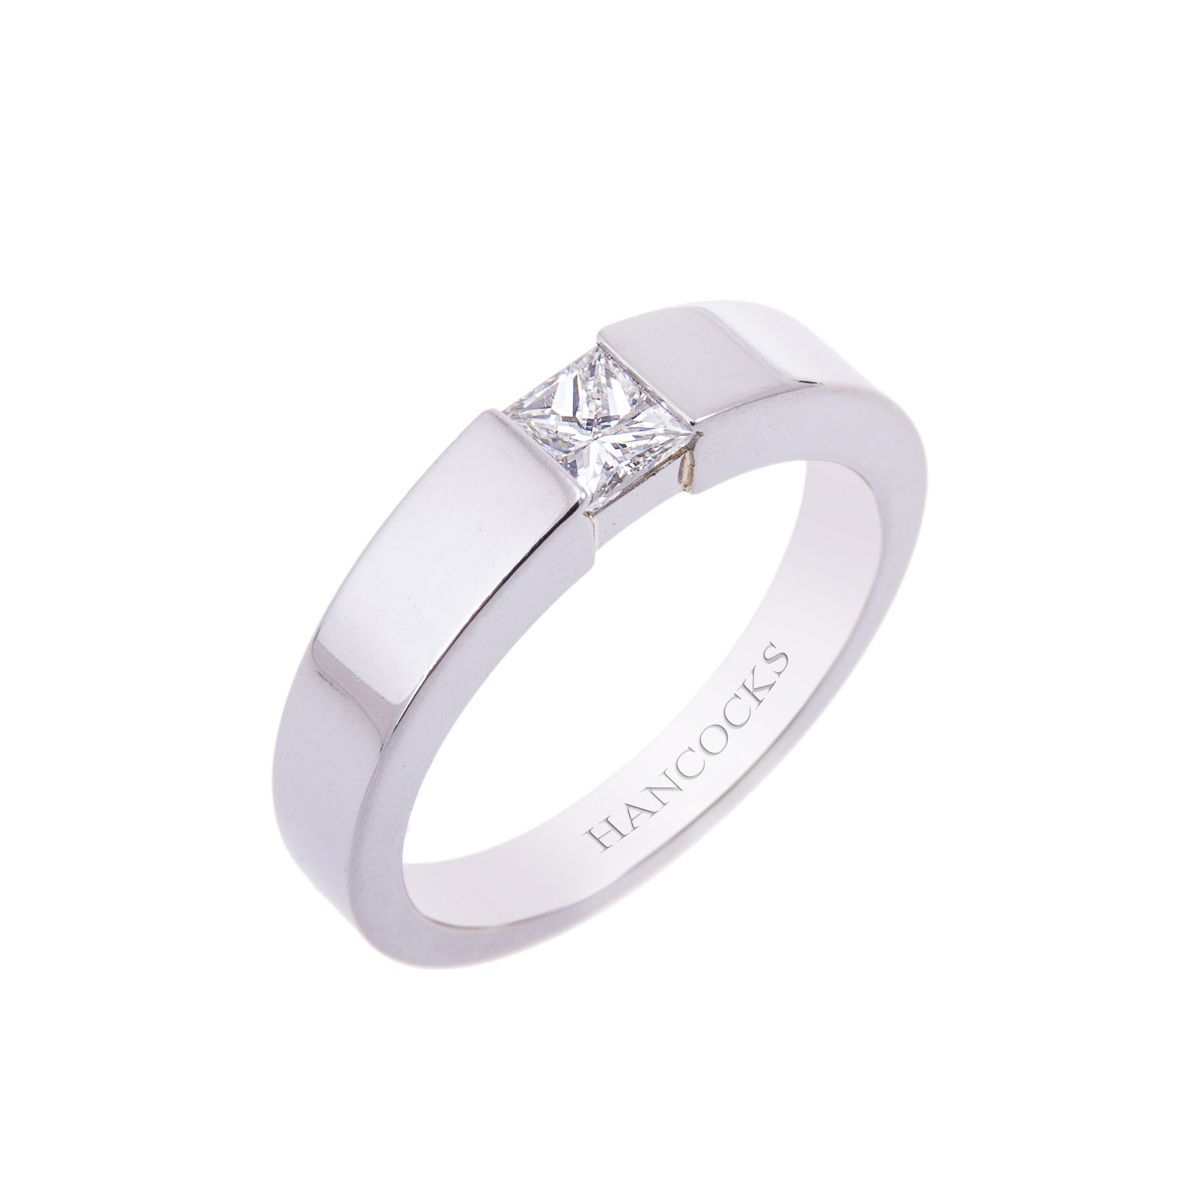 gents-princess-cut-diamond-set-band-in-platinum